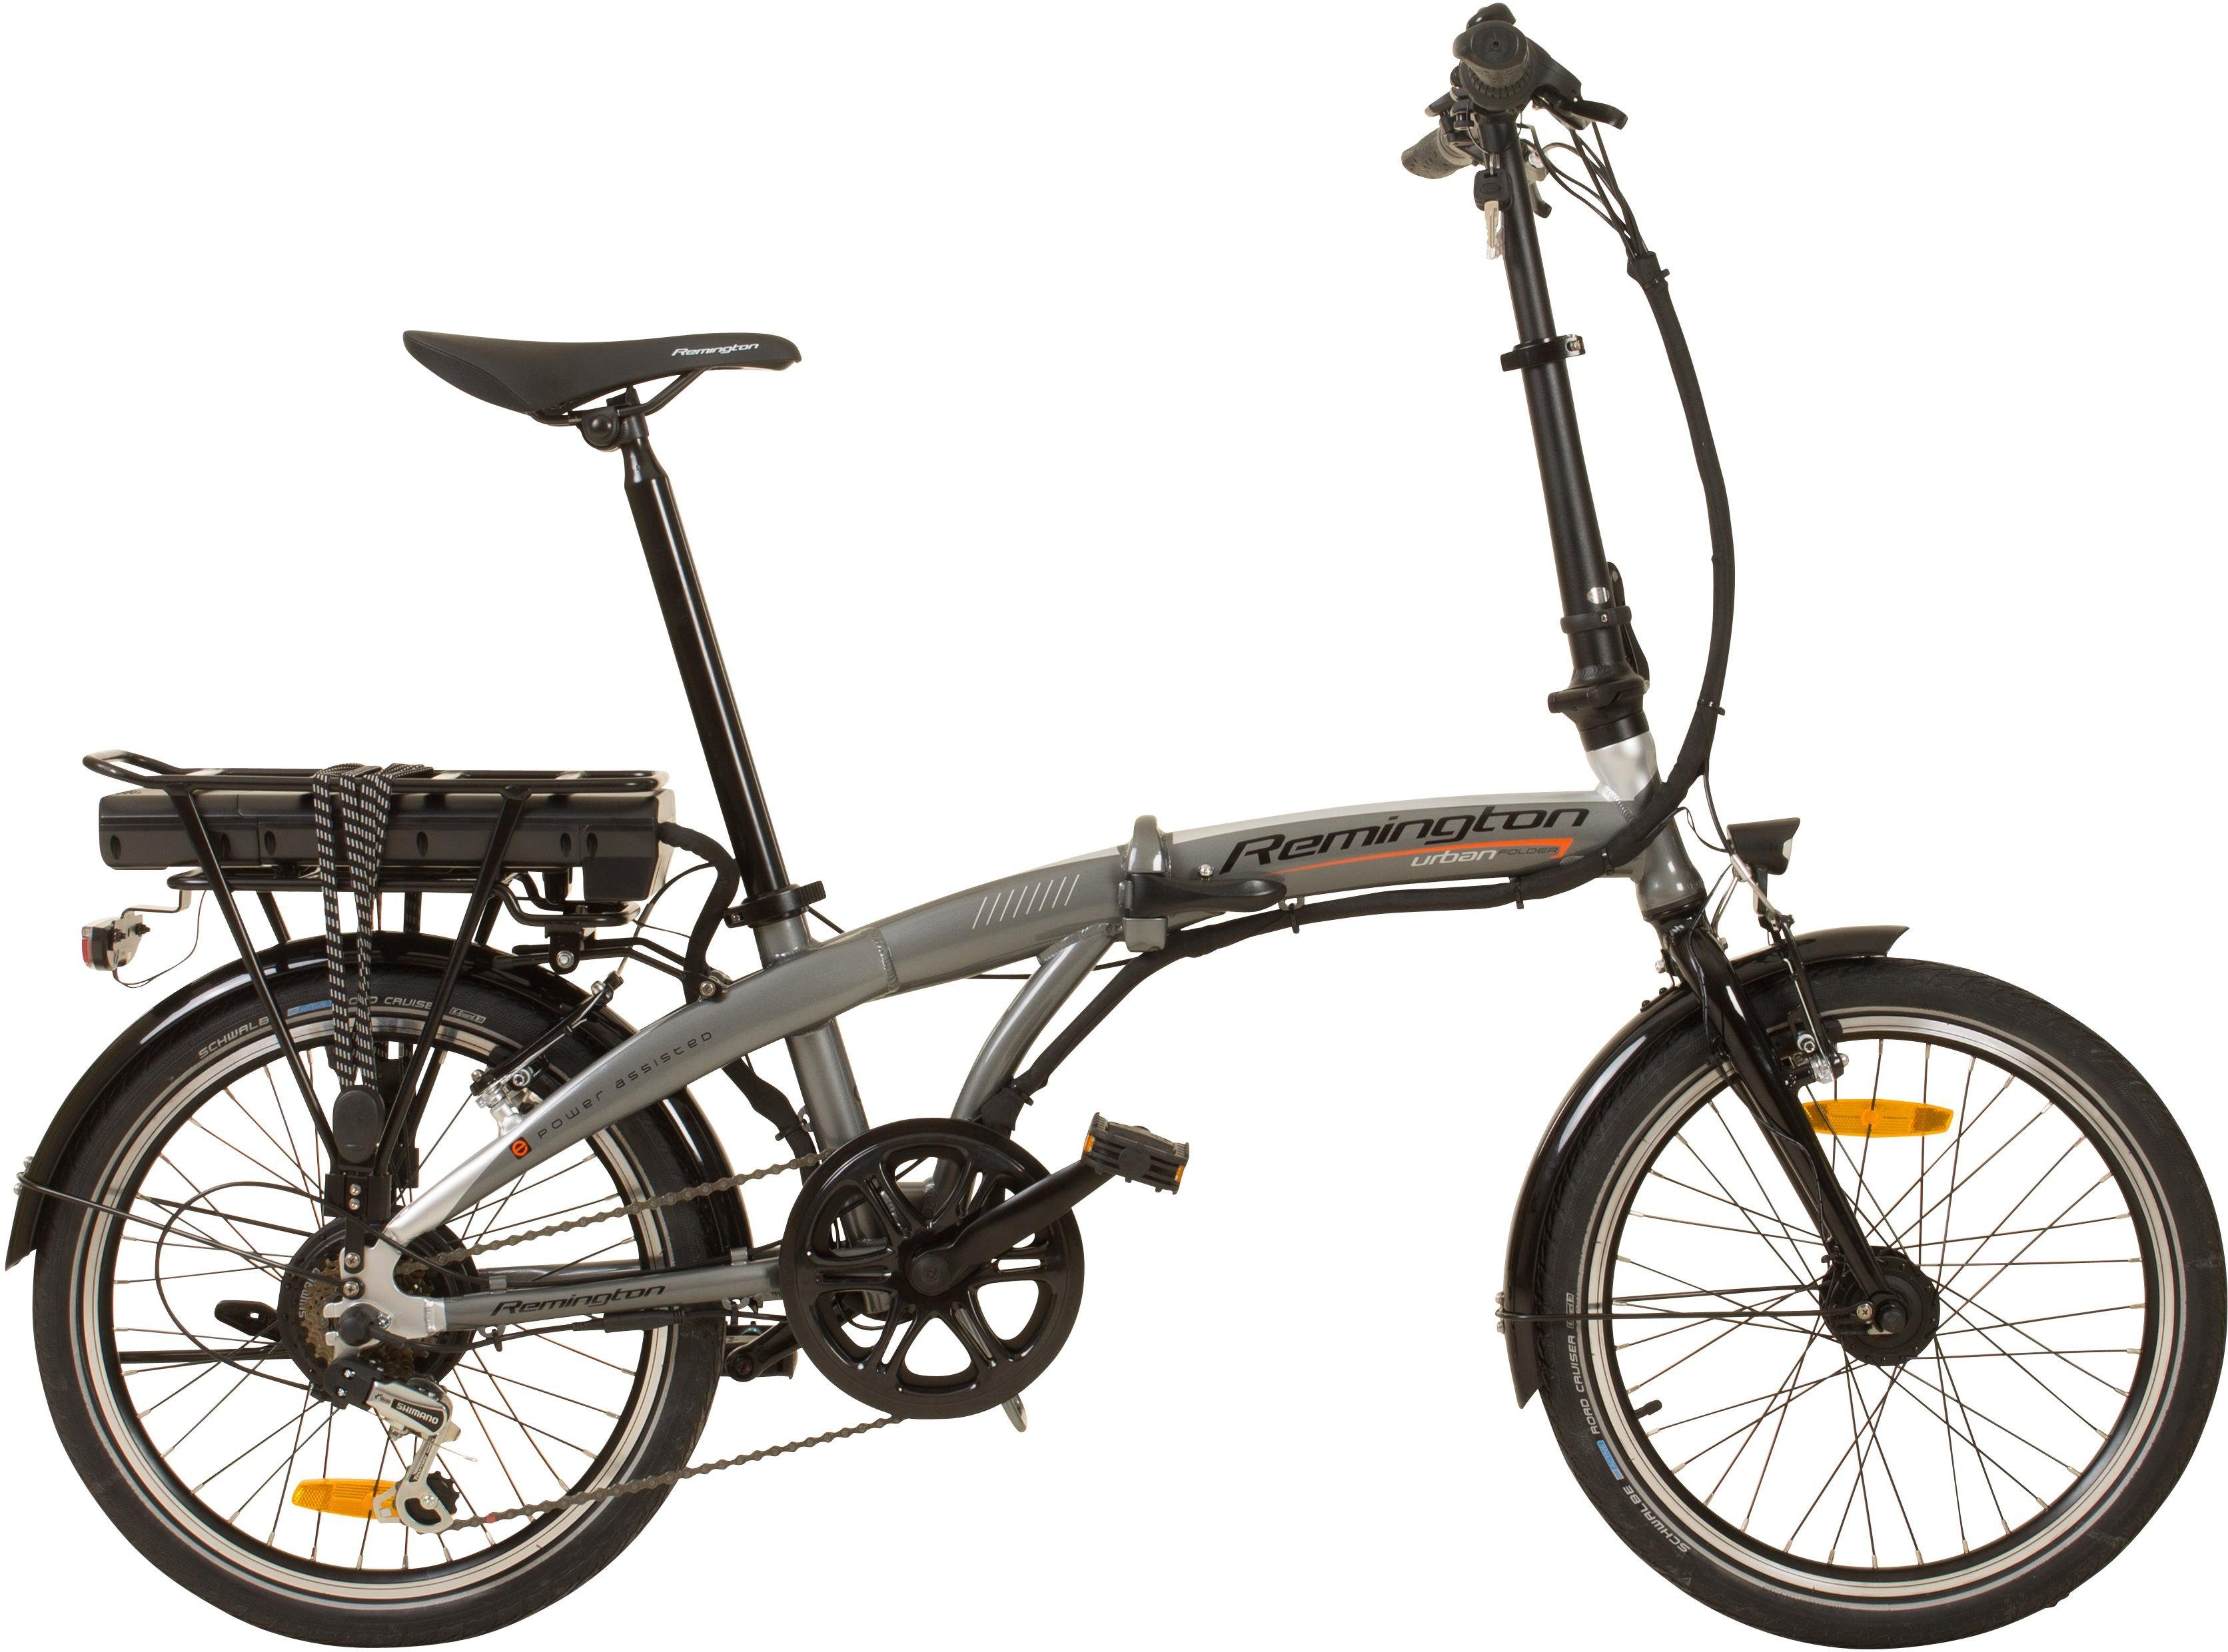 Remington E-Bike »Urban Folder«, 7 Gang Shimano, Kettenschaltung, Heckmotor 250 W